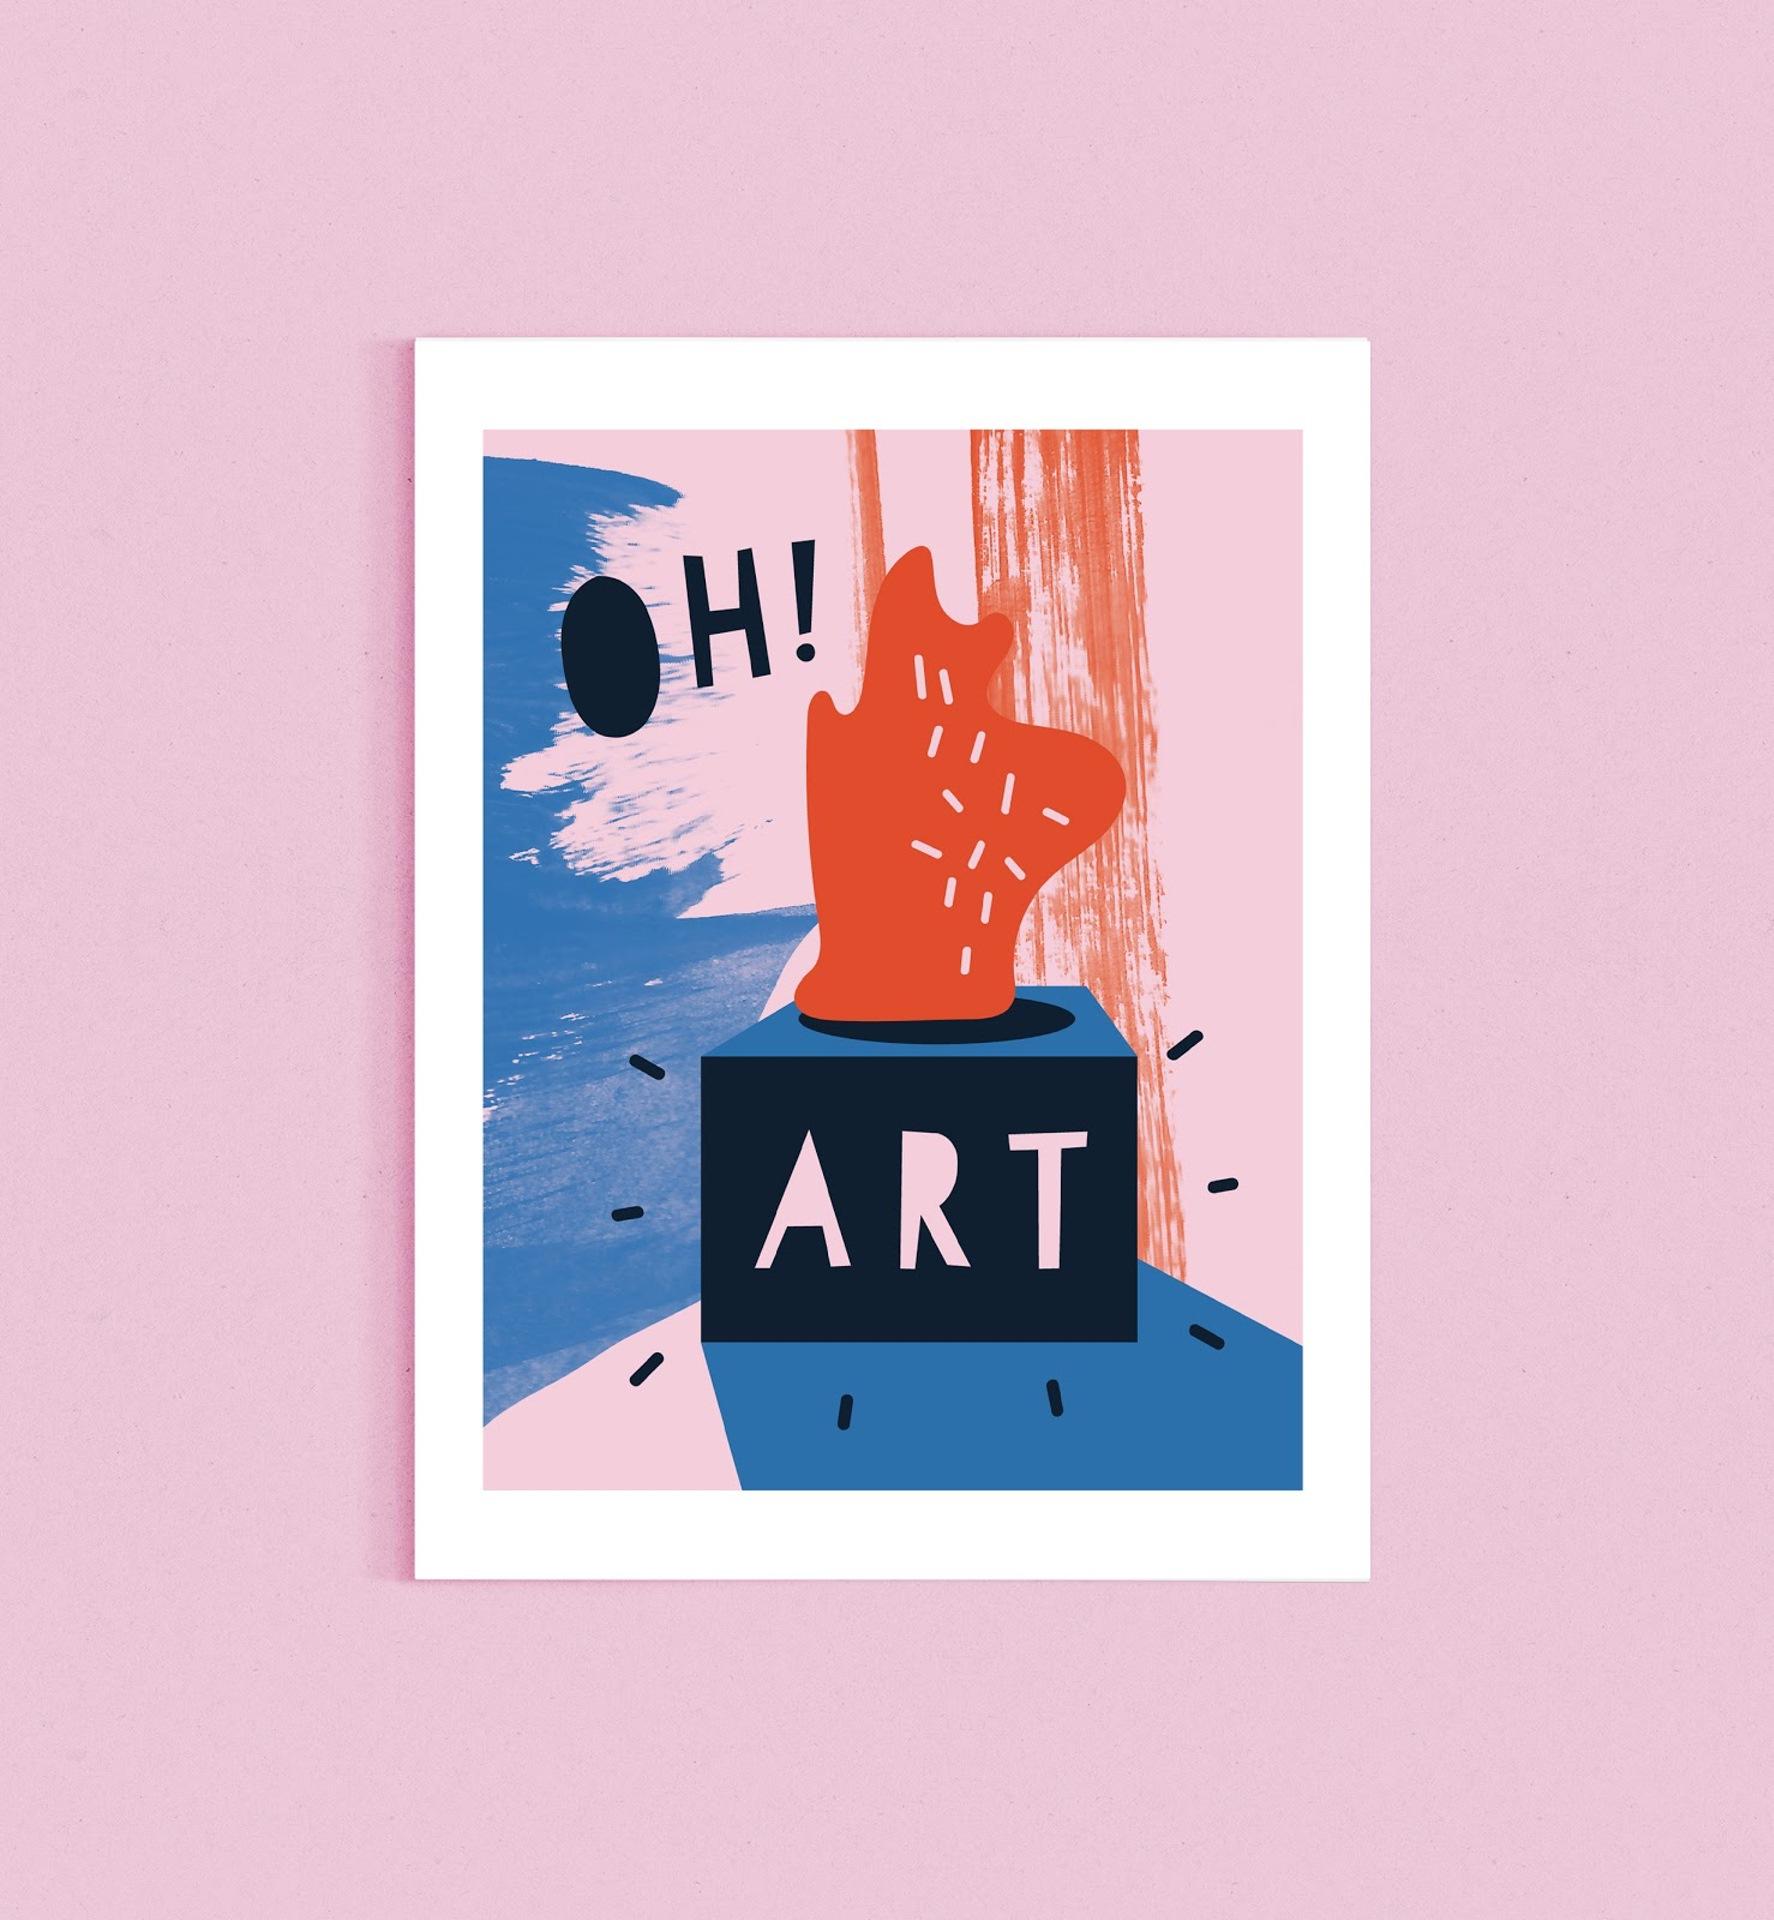 Elisabetta Vedovato – Graphic Designer, Illustrator